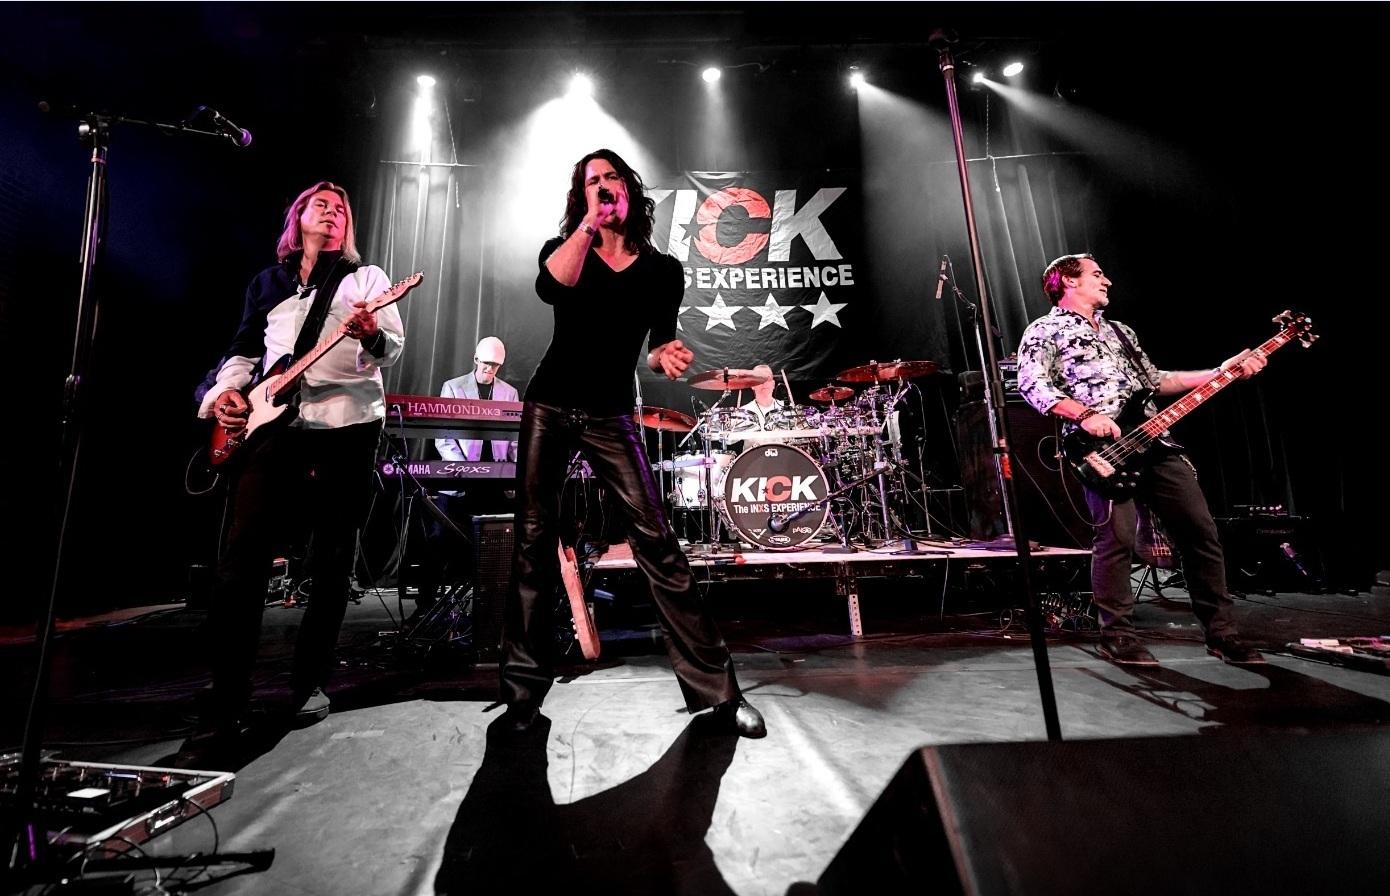 KICK - The INXS Experience Brings Australian Rockers' Biggest Hits To City Winery Atlanta